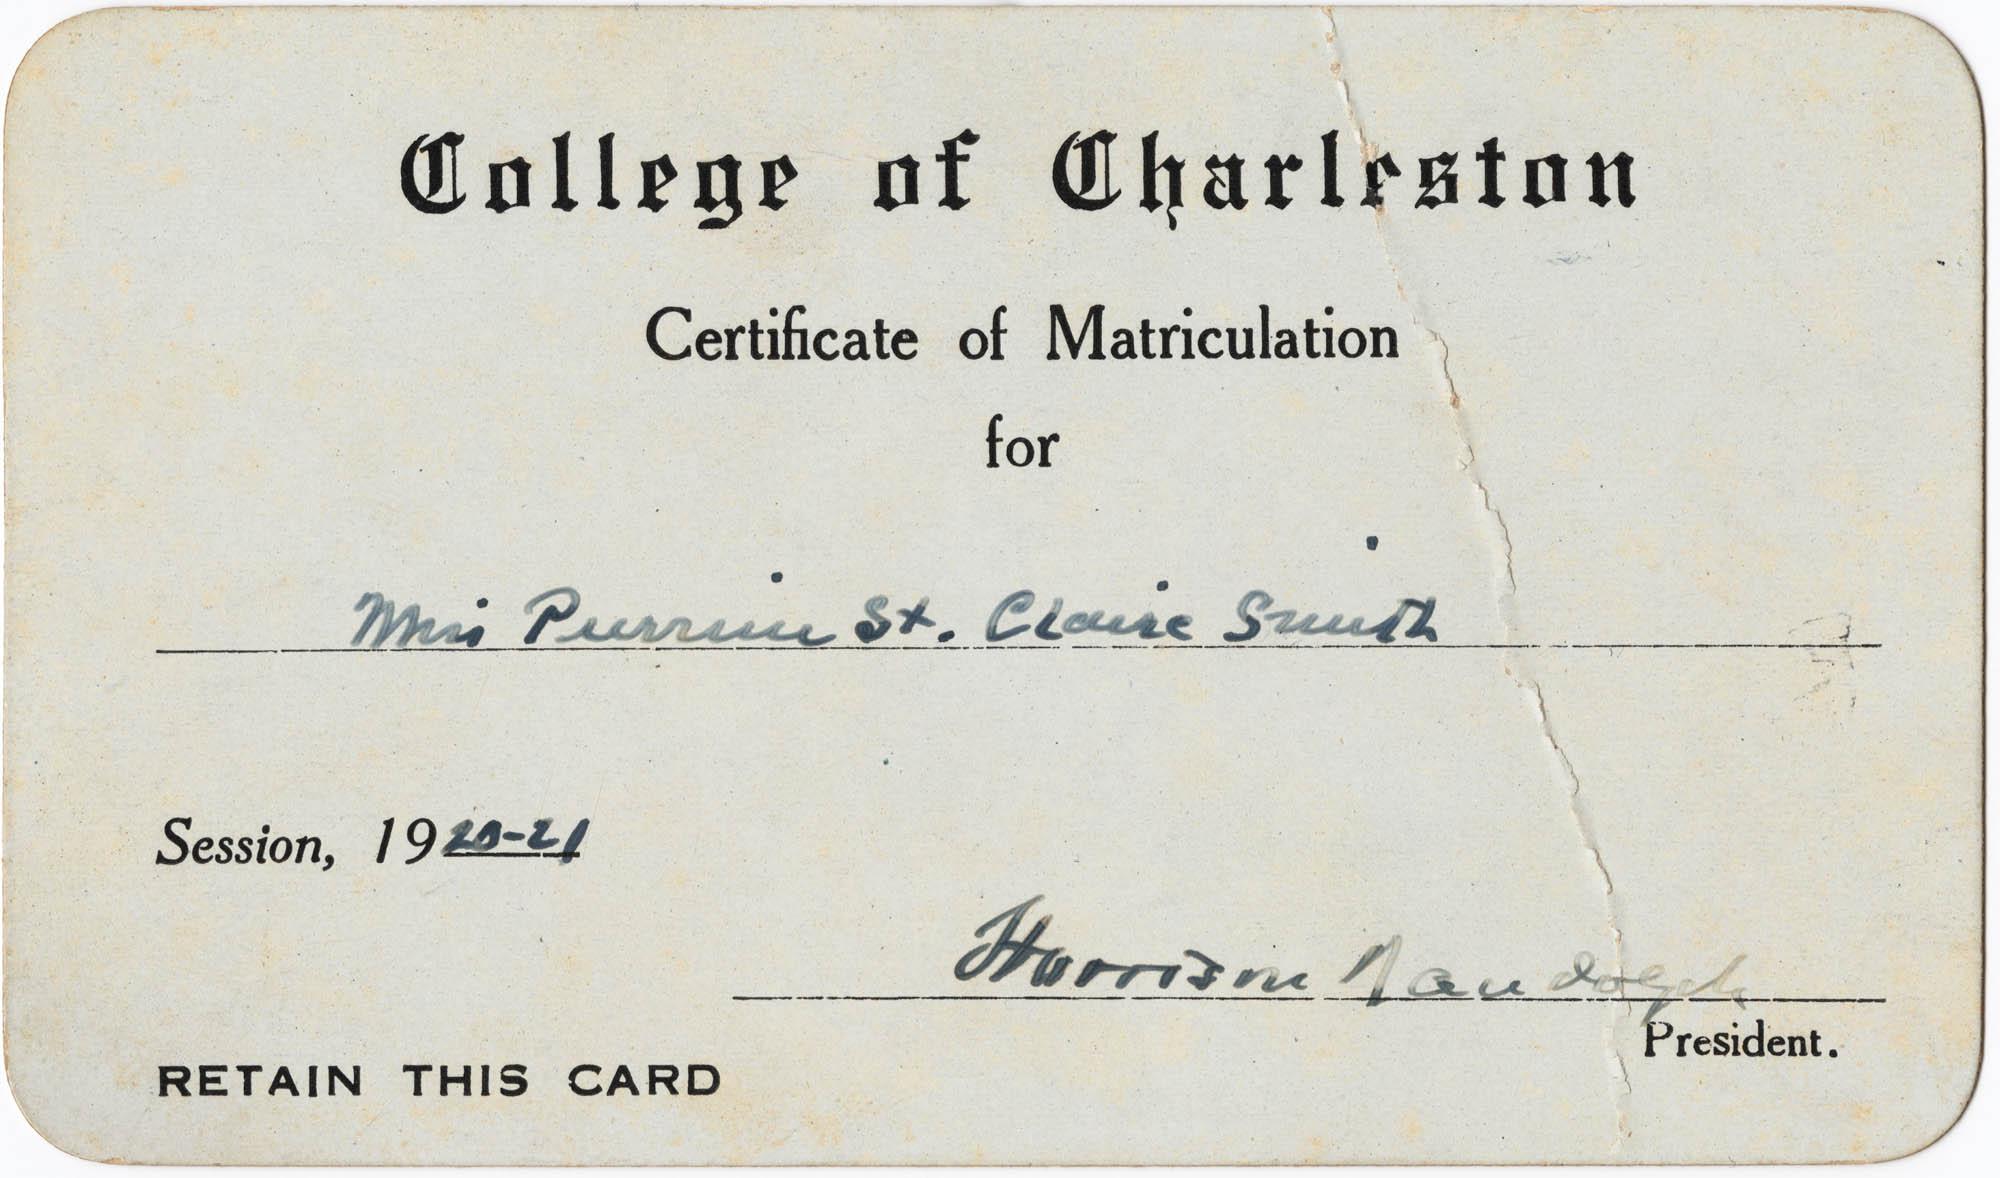 Certificate of Matriculation